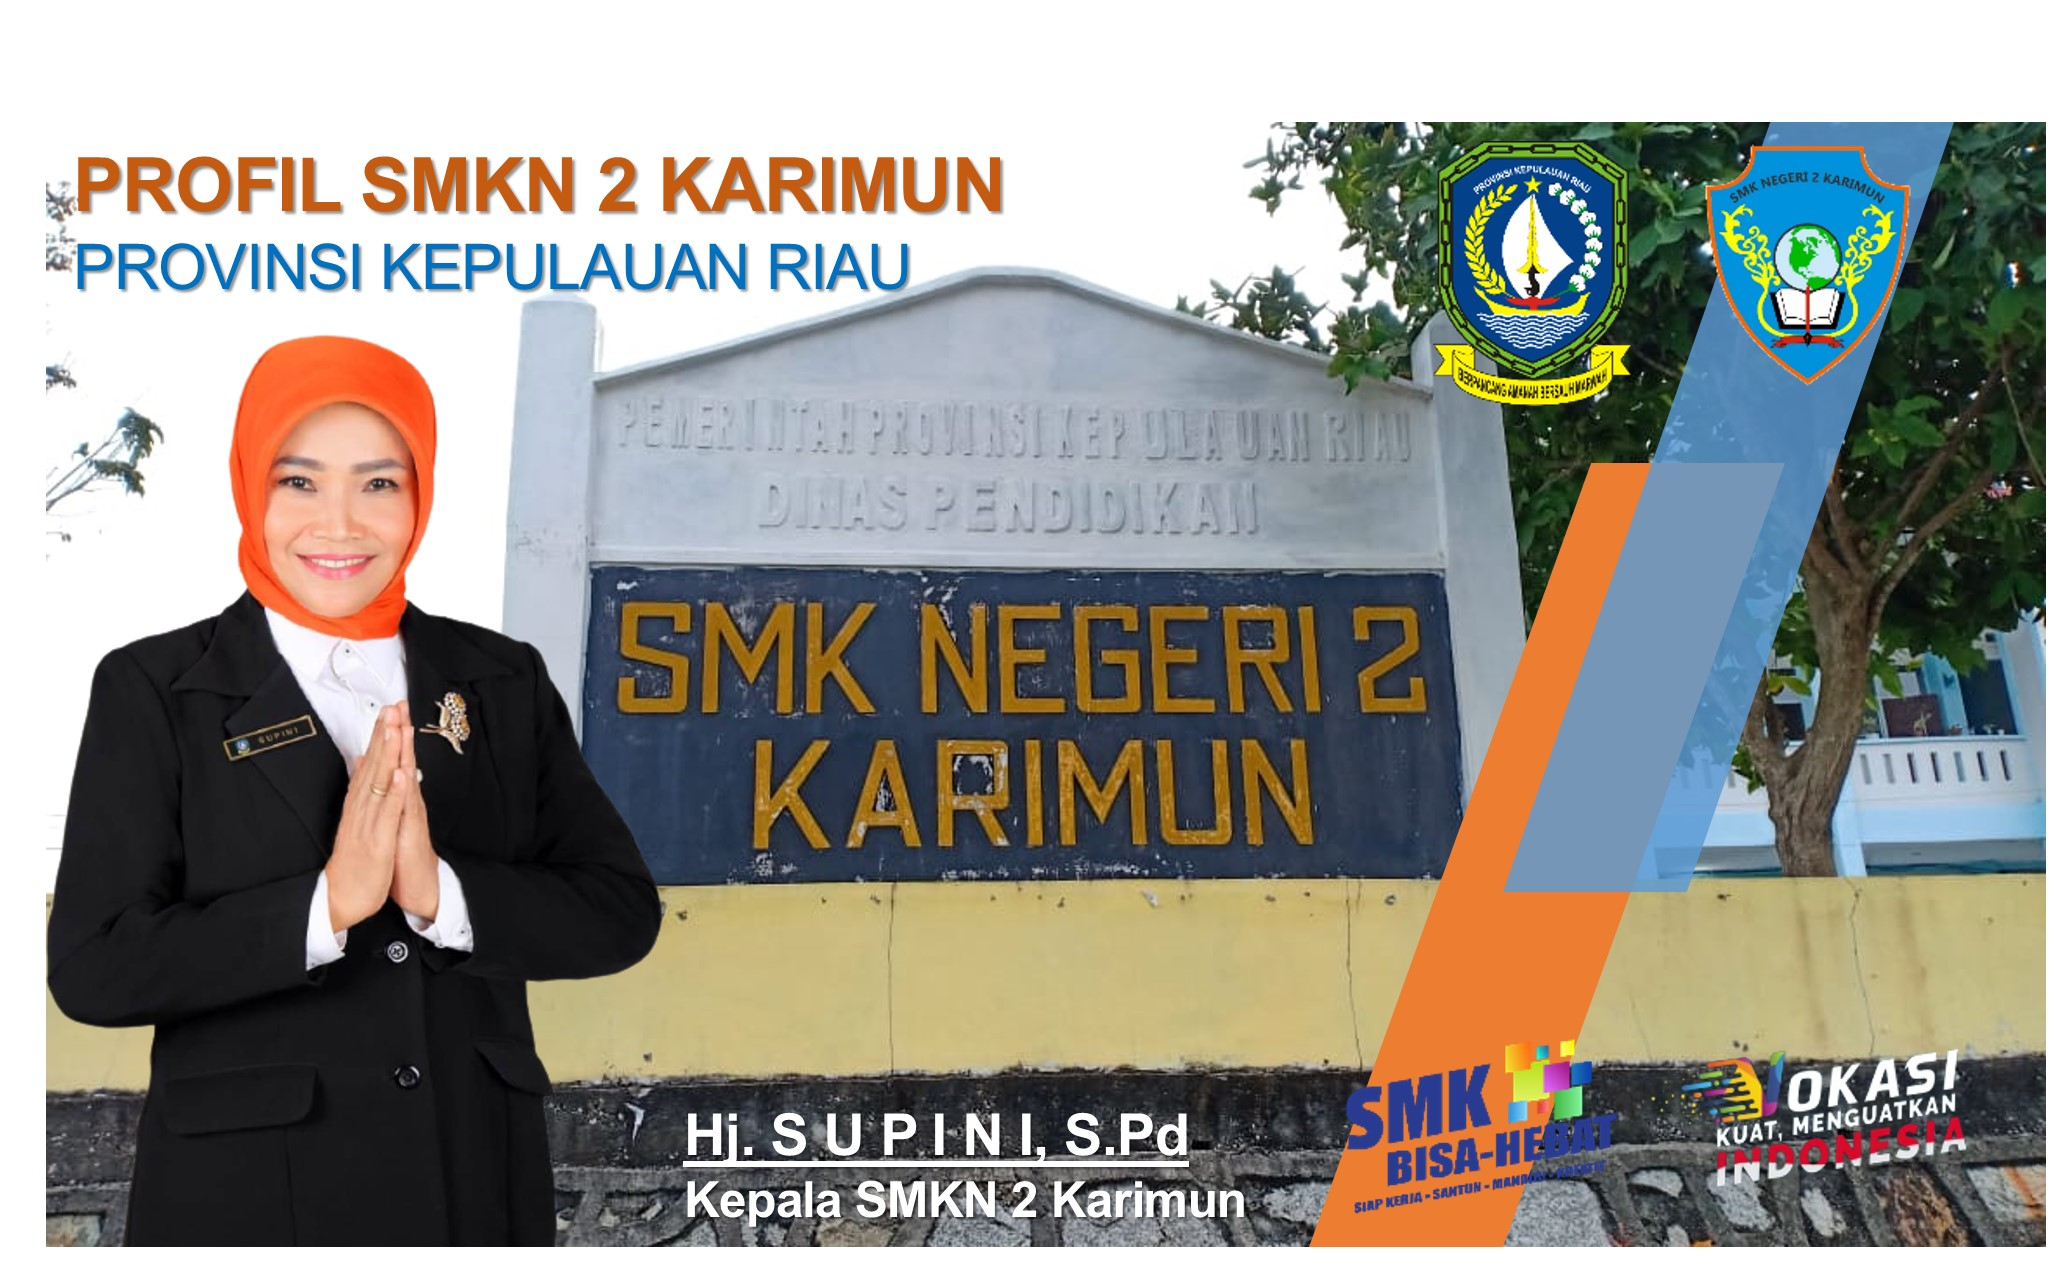 PROFIL SMKN 2 KARIMUN